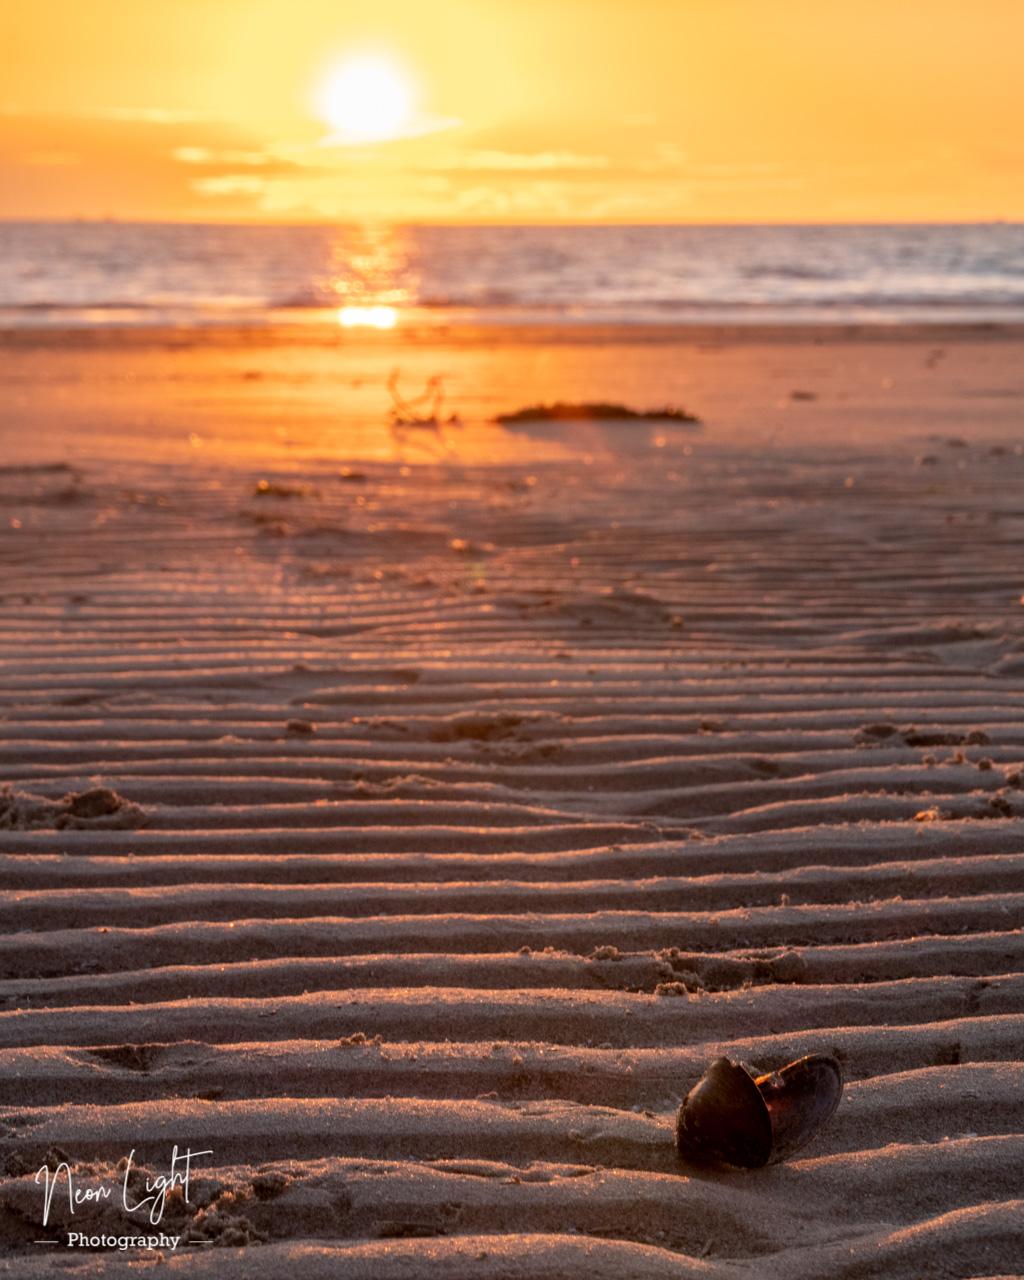 Sand, Sea and Sunset